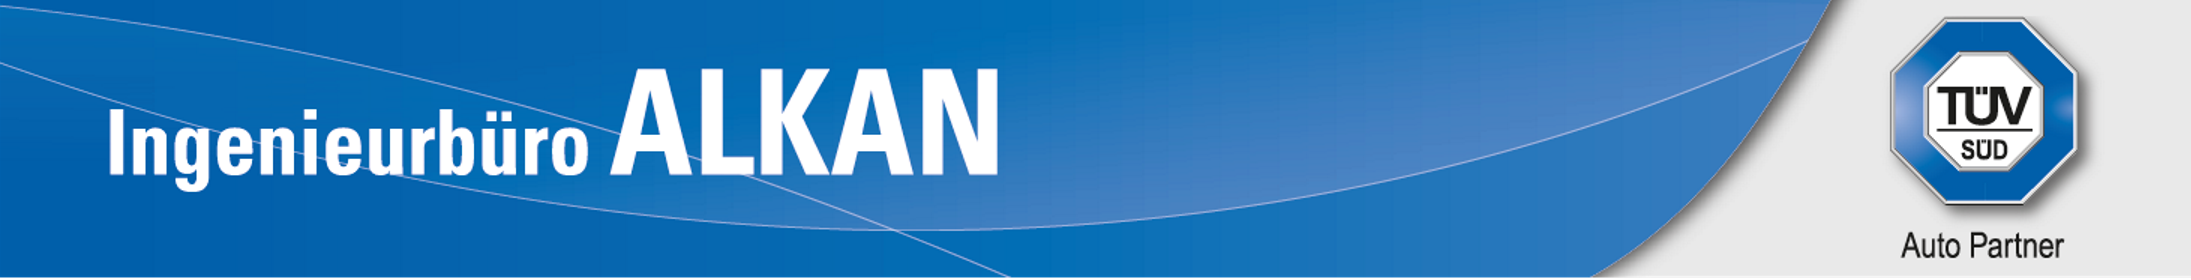 Ingenieurbüro Alkan Logo